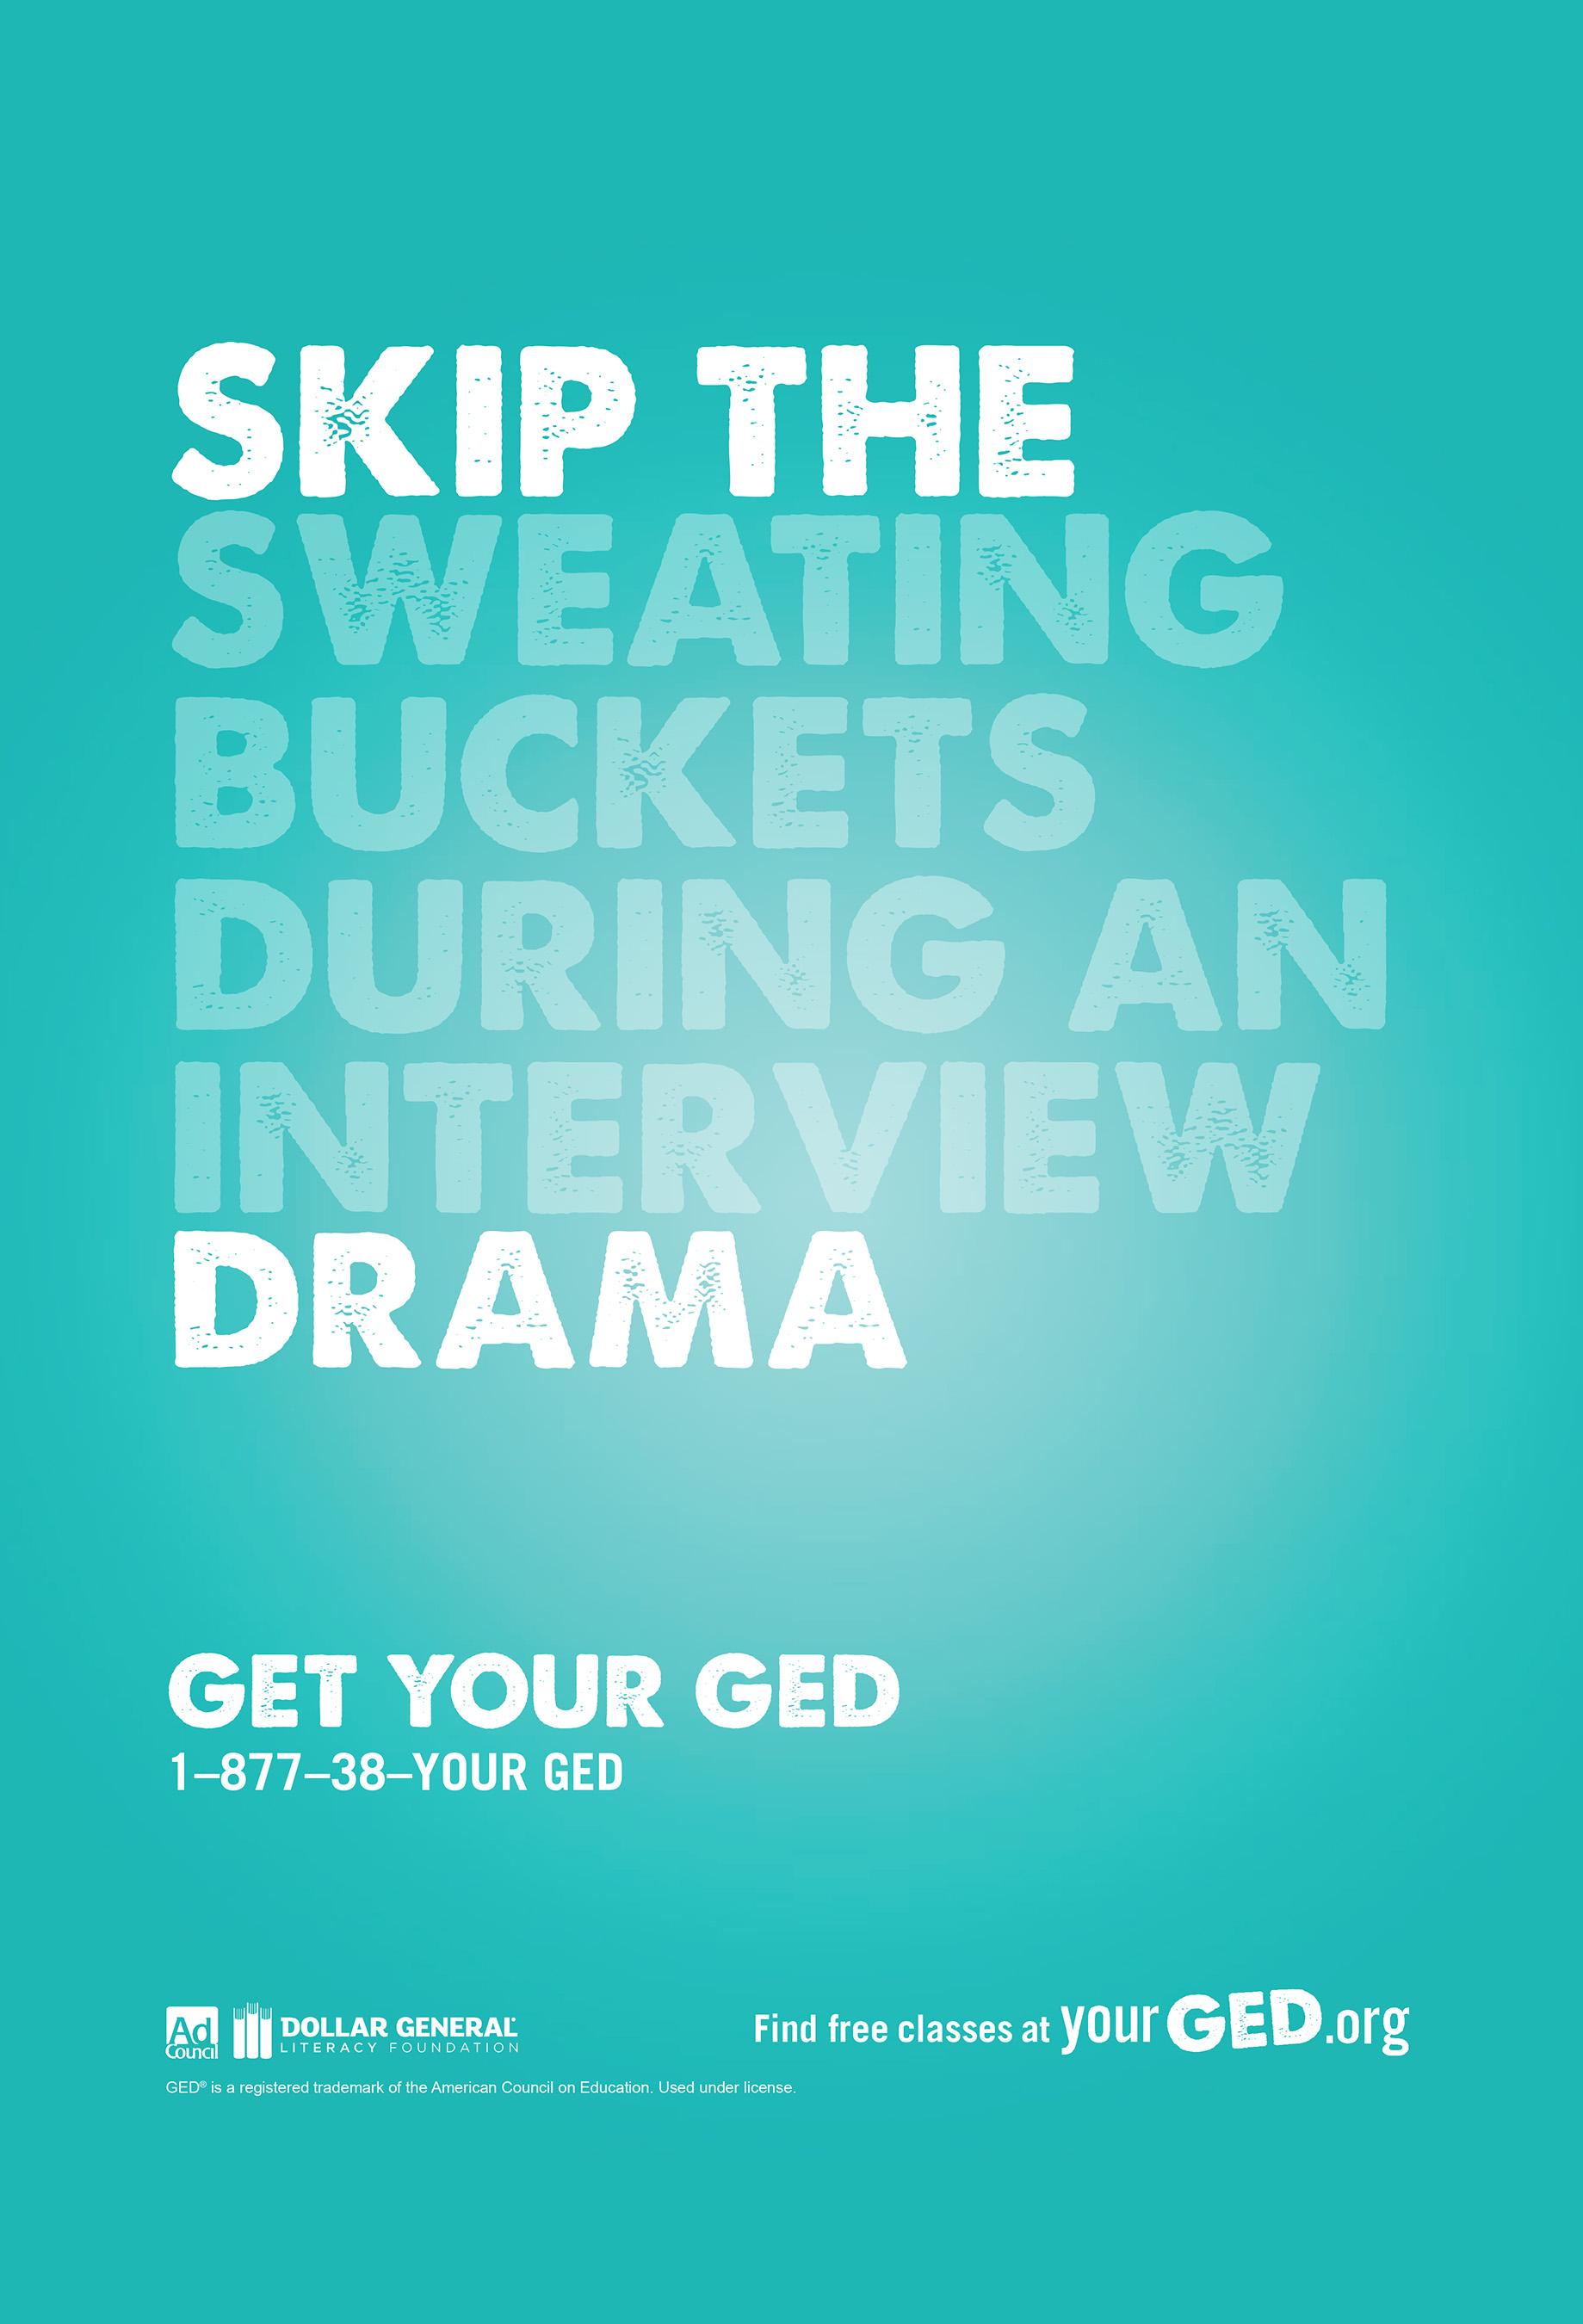 http://www.multivu.com/players/English/7292751-ad-council-dollar-general-literacy-foundation-encourage-young-adults-pursue-ged-diploma/gallery/image/43f49edd-ad53-4c20-9469-3bfaf1278ed8.HR.jpg